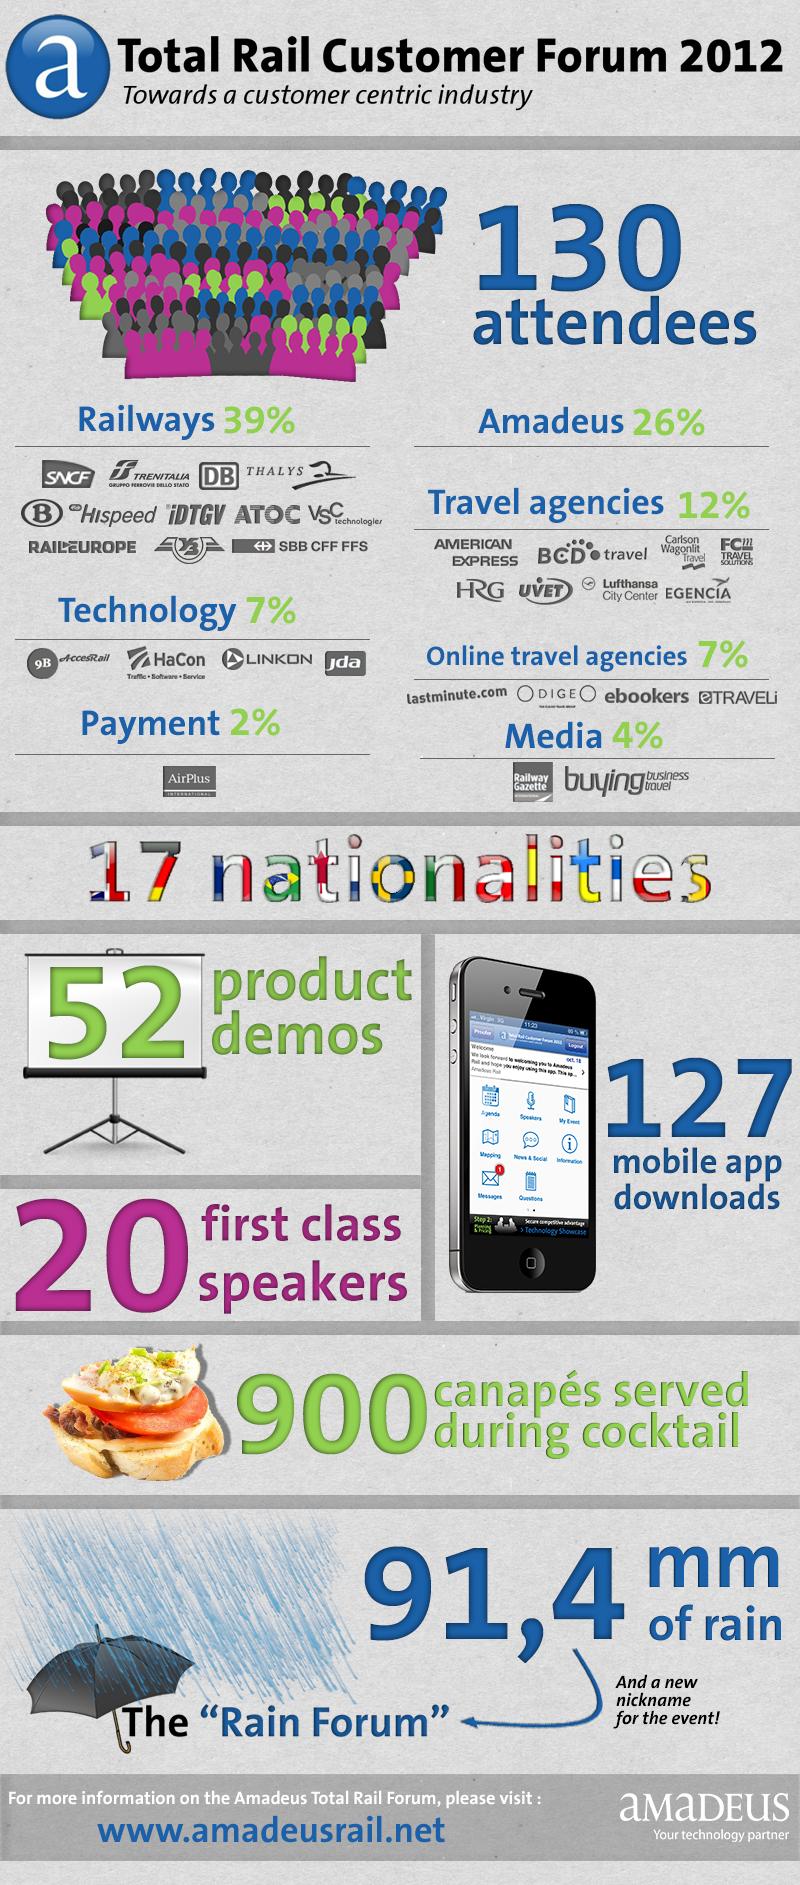 Amadeus Total Rail Forum 2012 Infographic